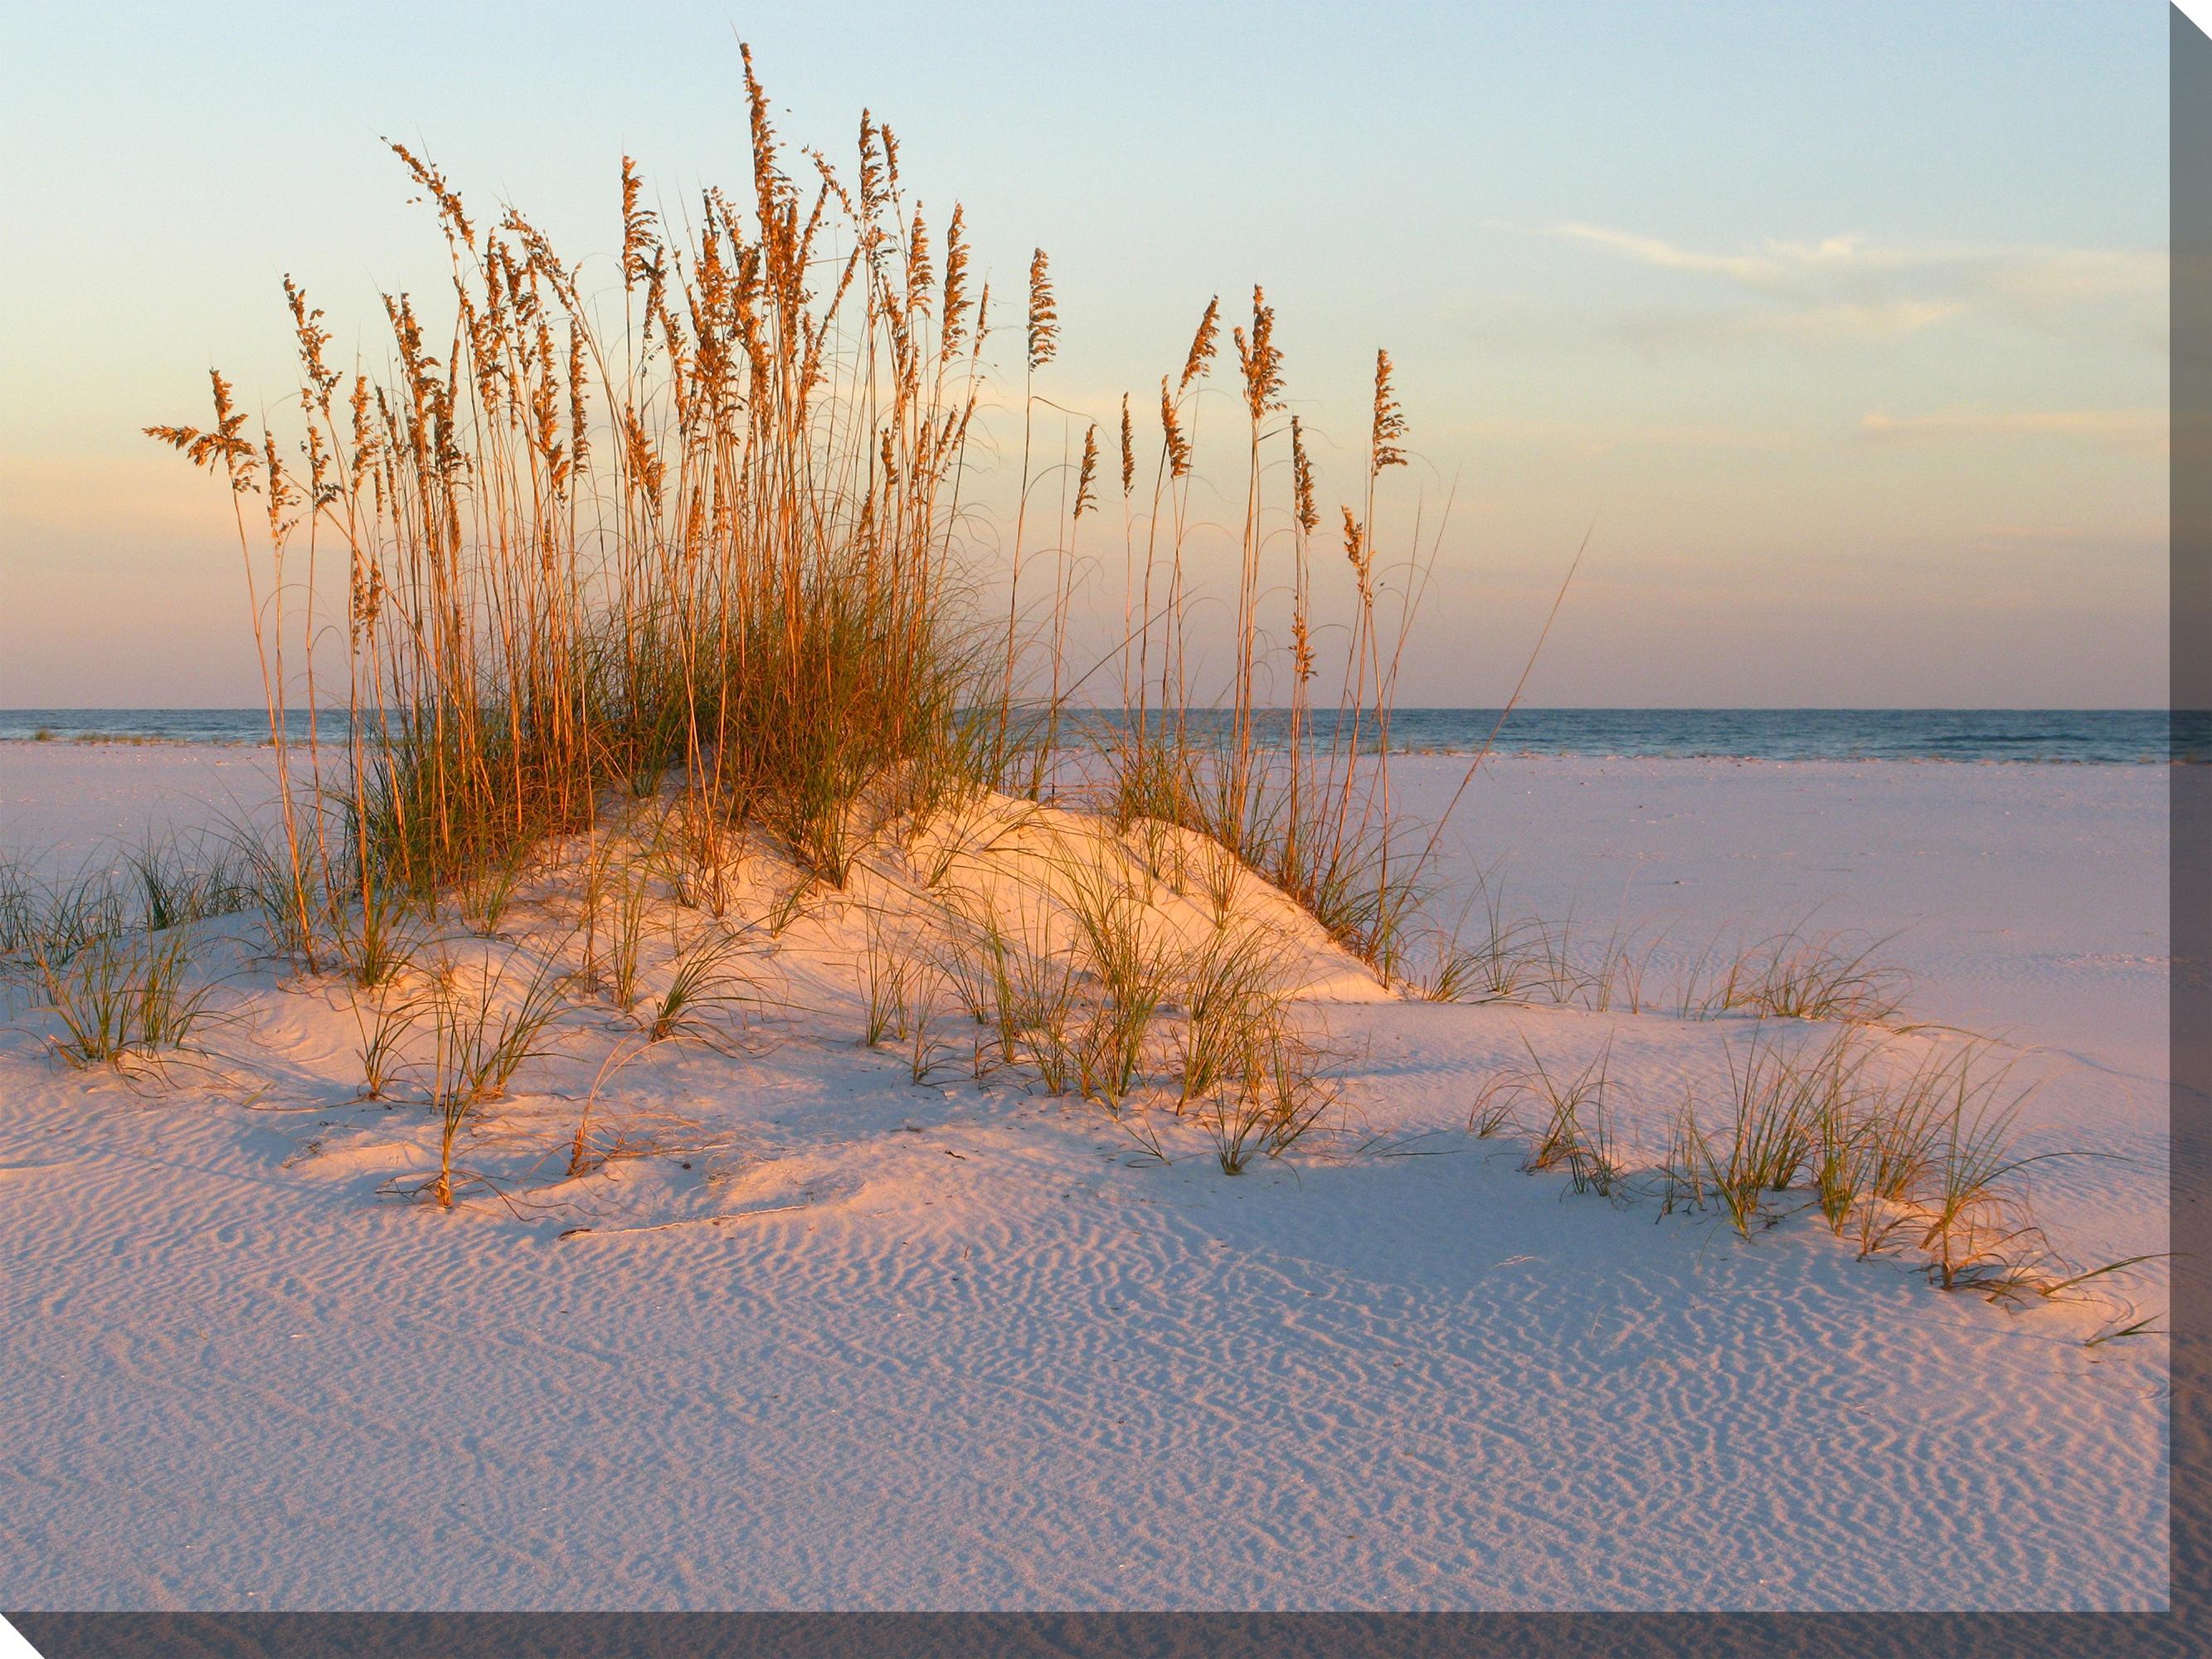 Canvas Wall Art Sea Oats Sand Product Photo